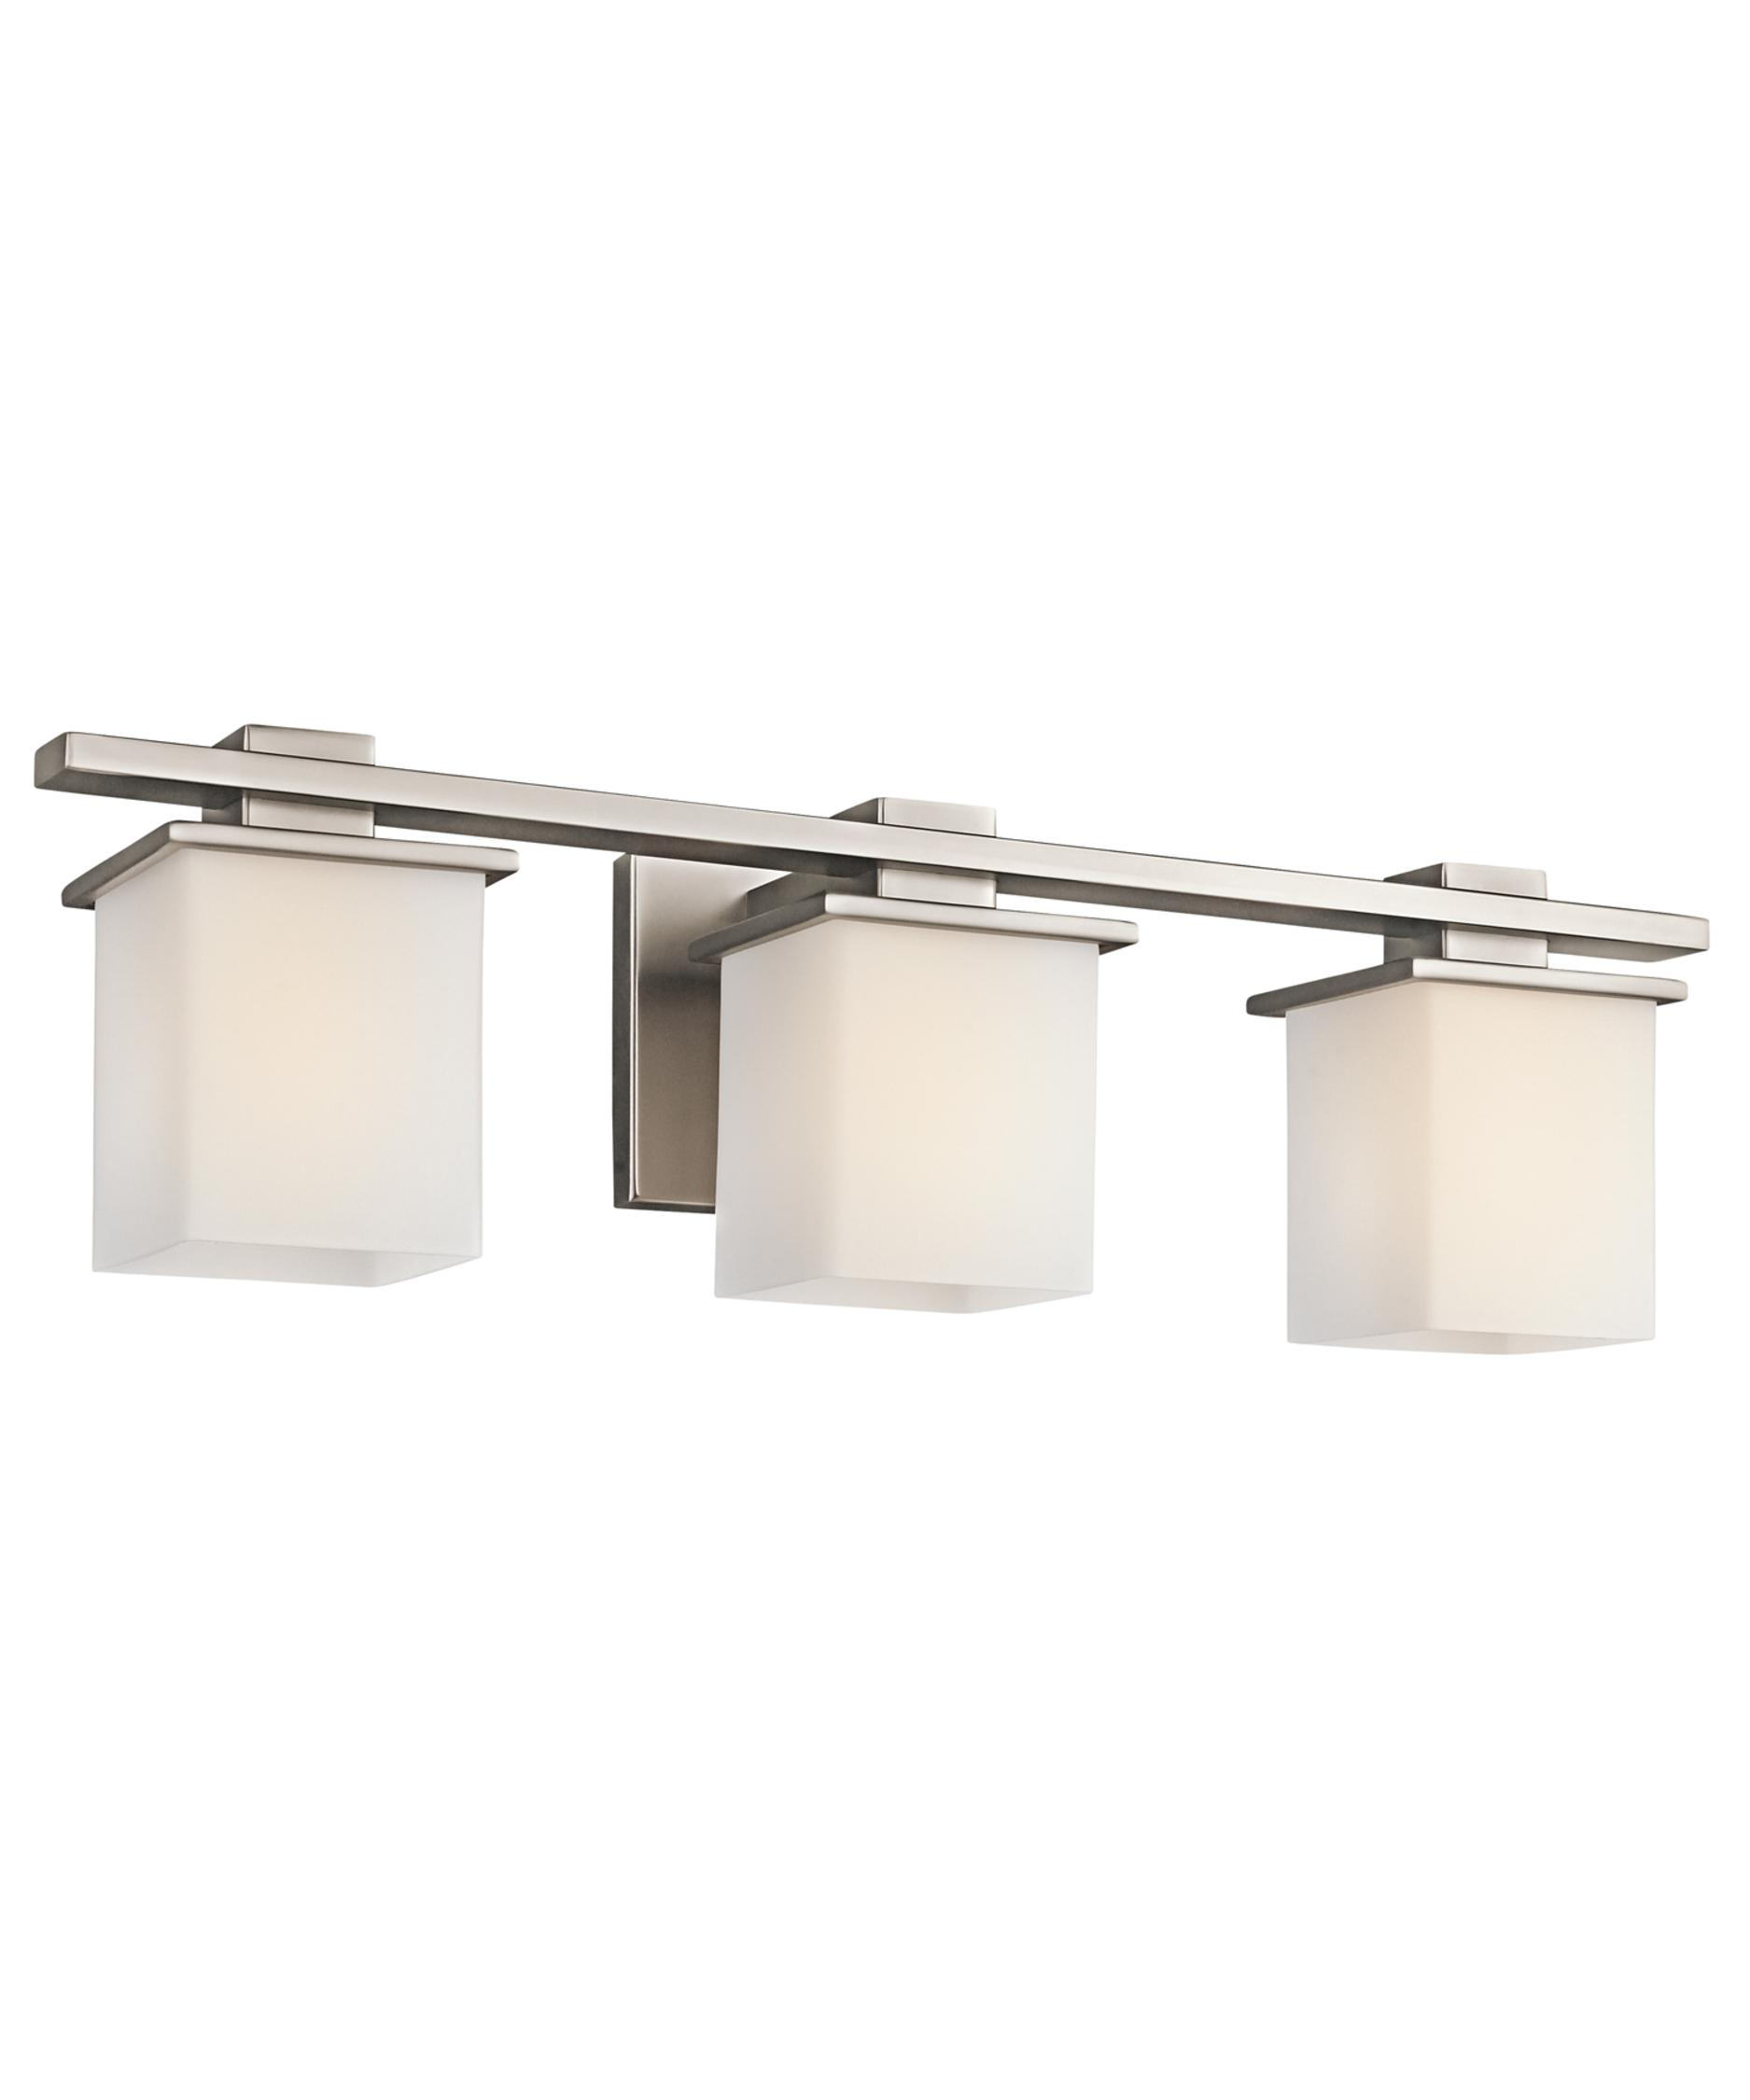 Bathroom Vanity Lights Kichler kichler 45151 tully 24 inch wide bath vanity light | capitol